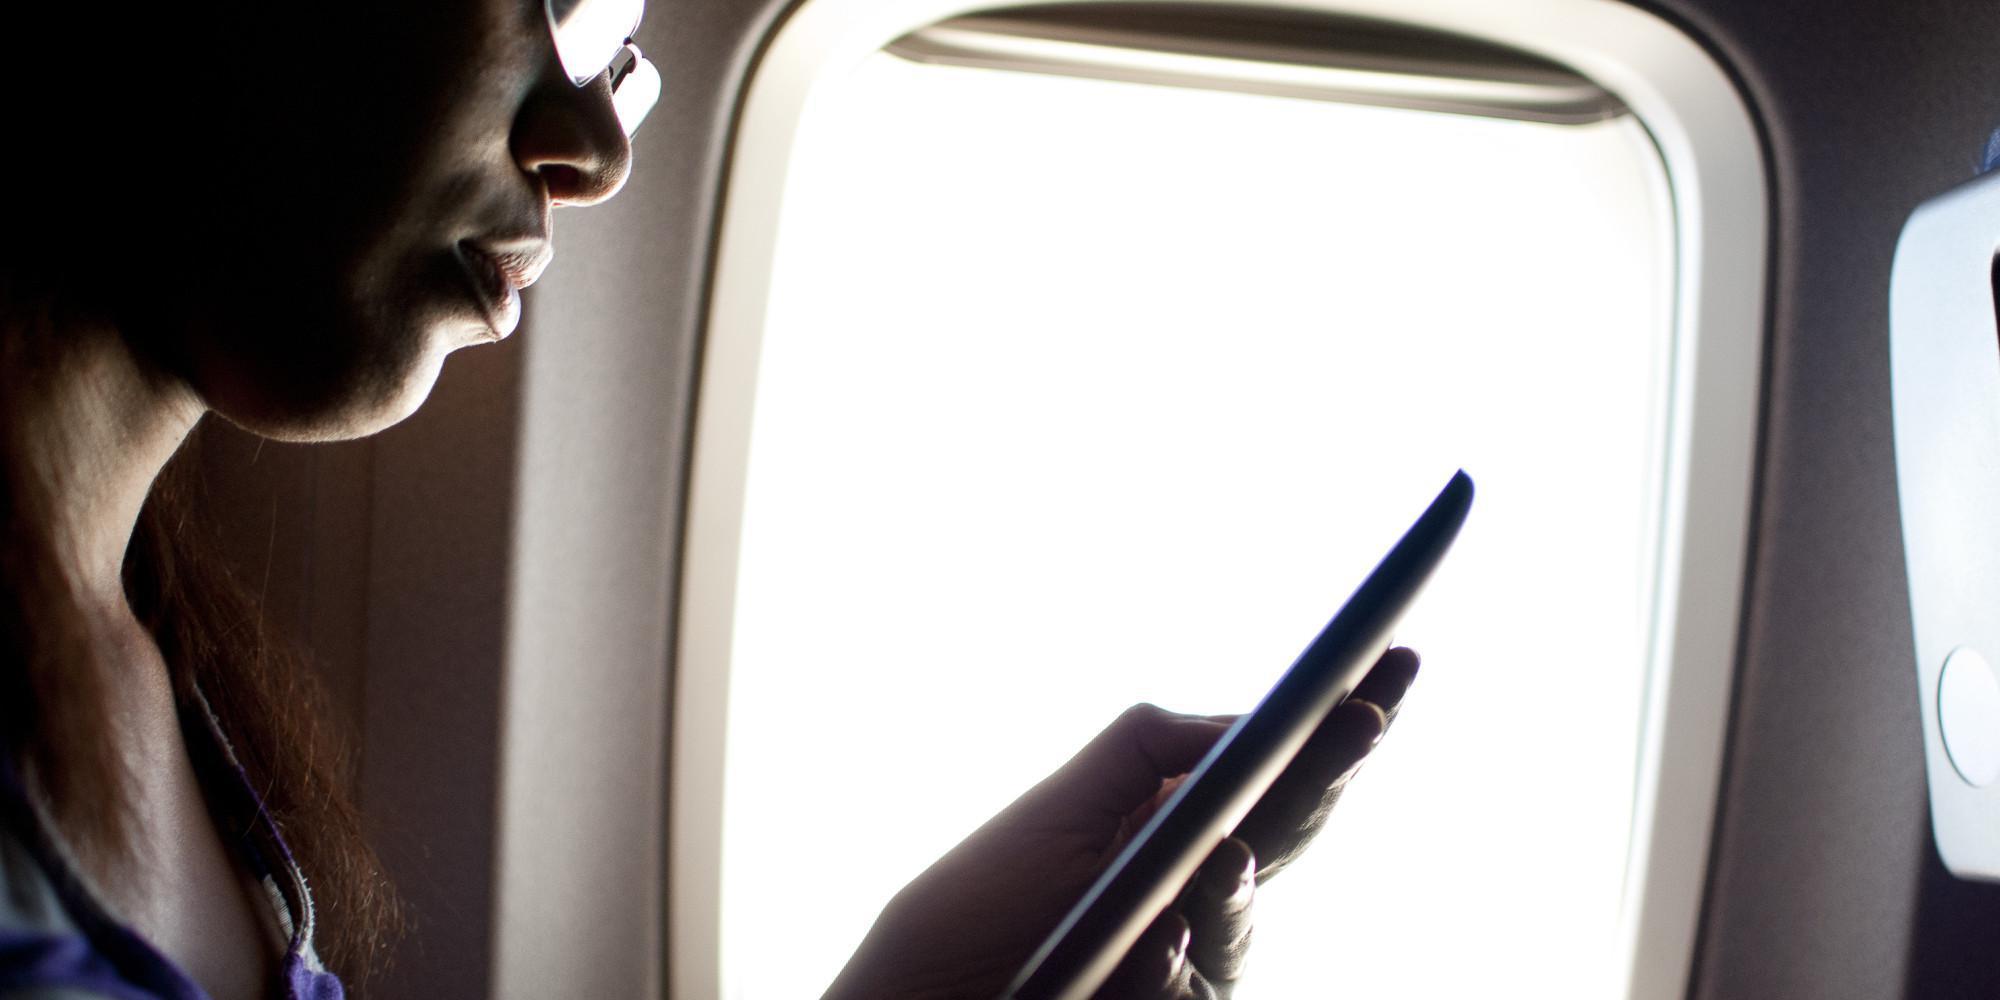 A woman using an ereader on a plane